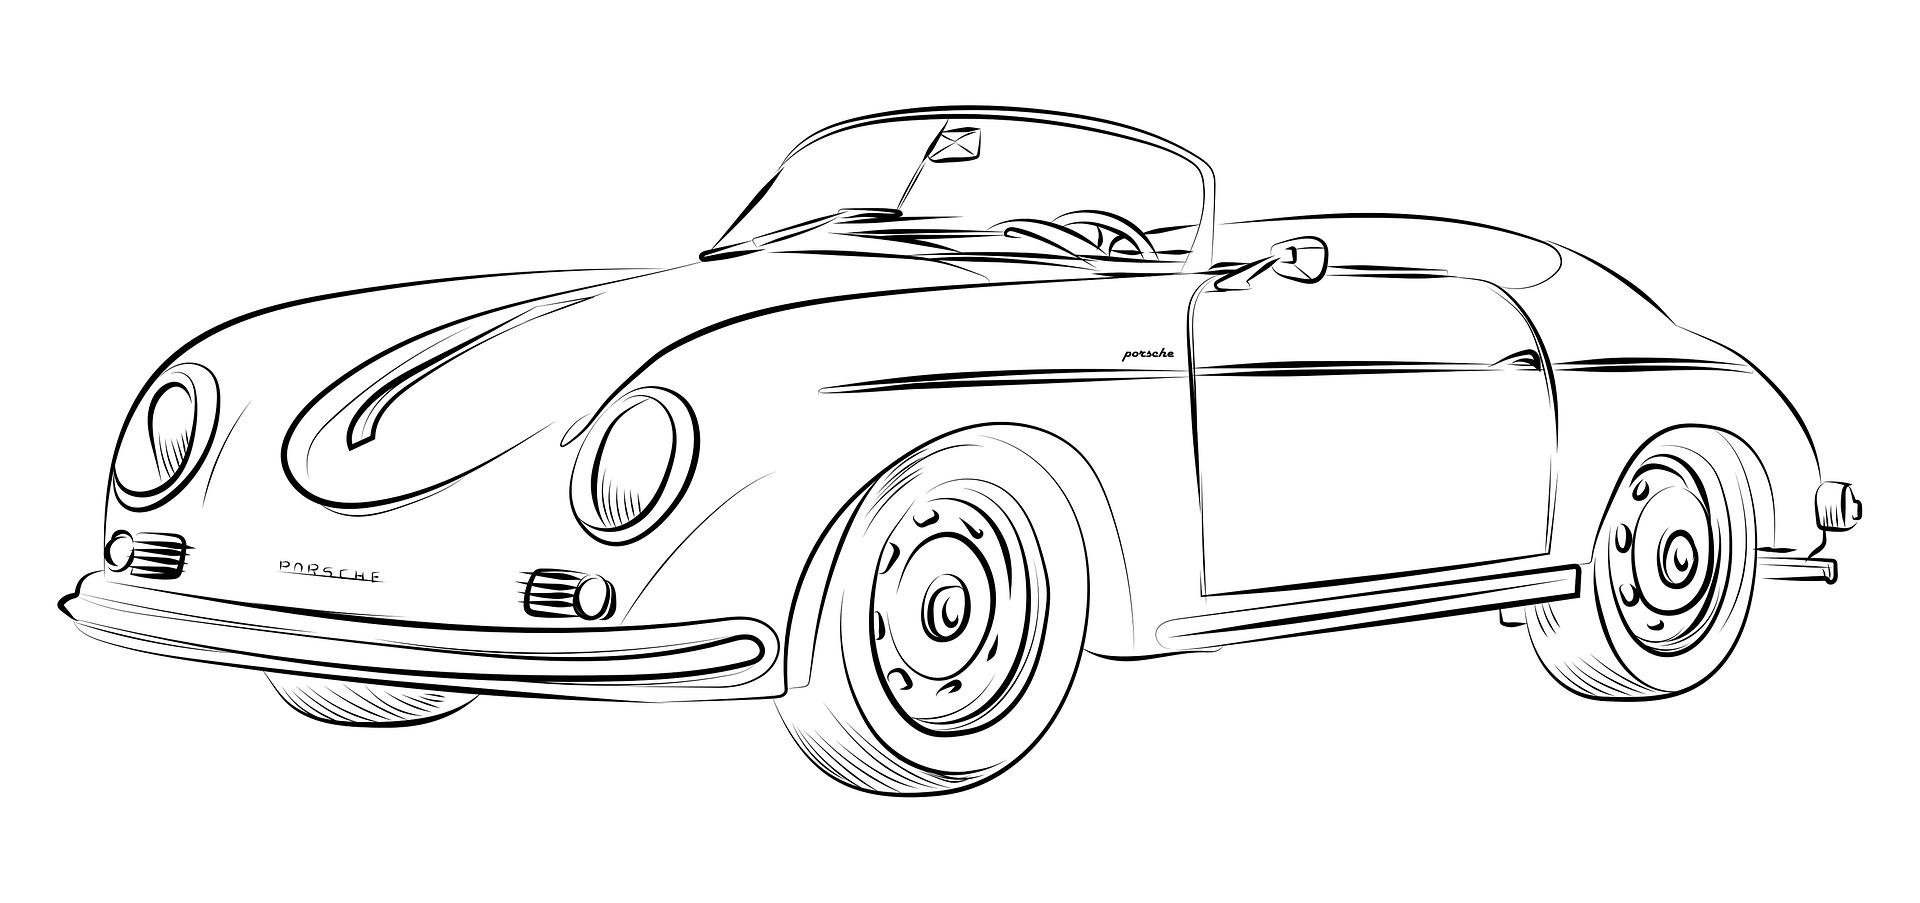 Porsche Kolorowanka Do Druku